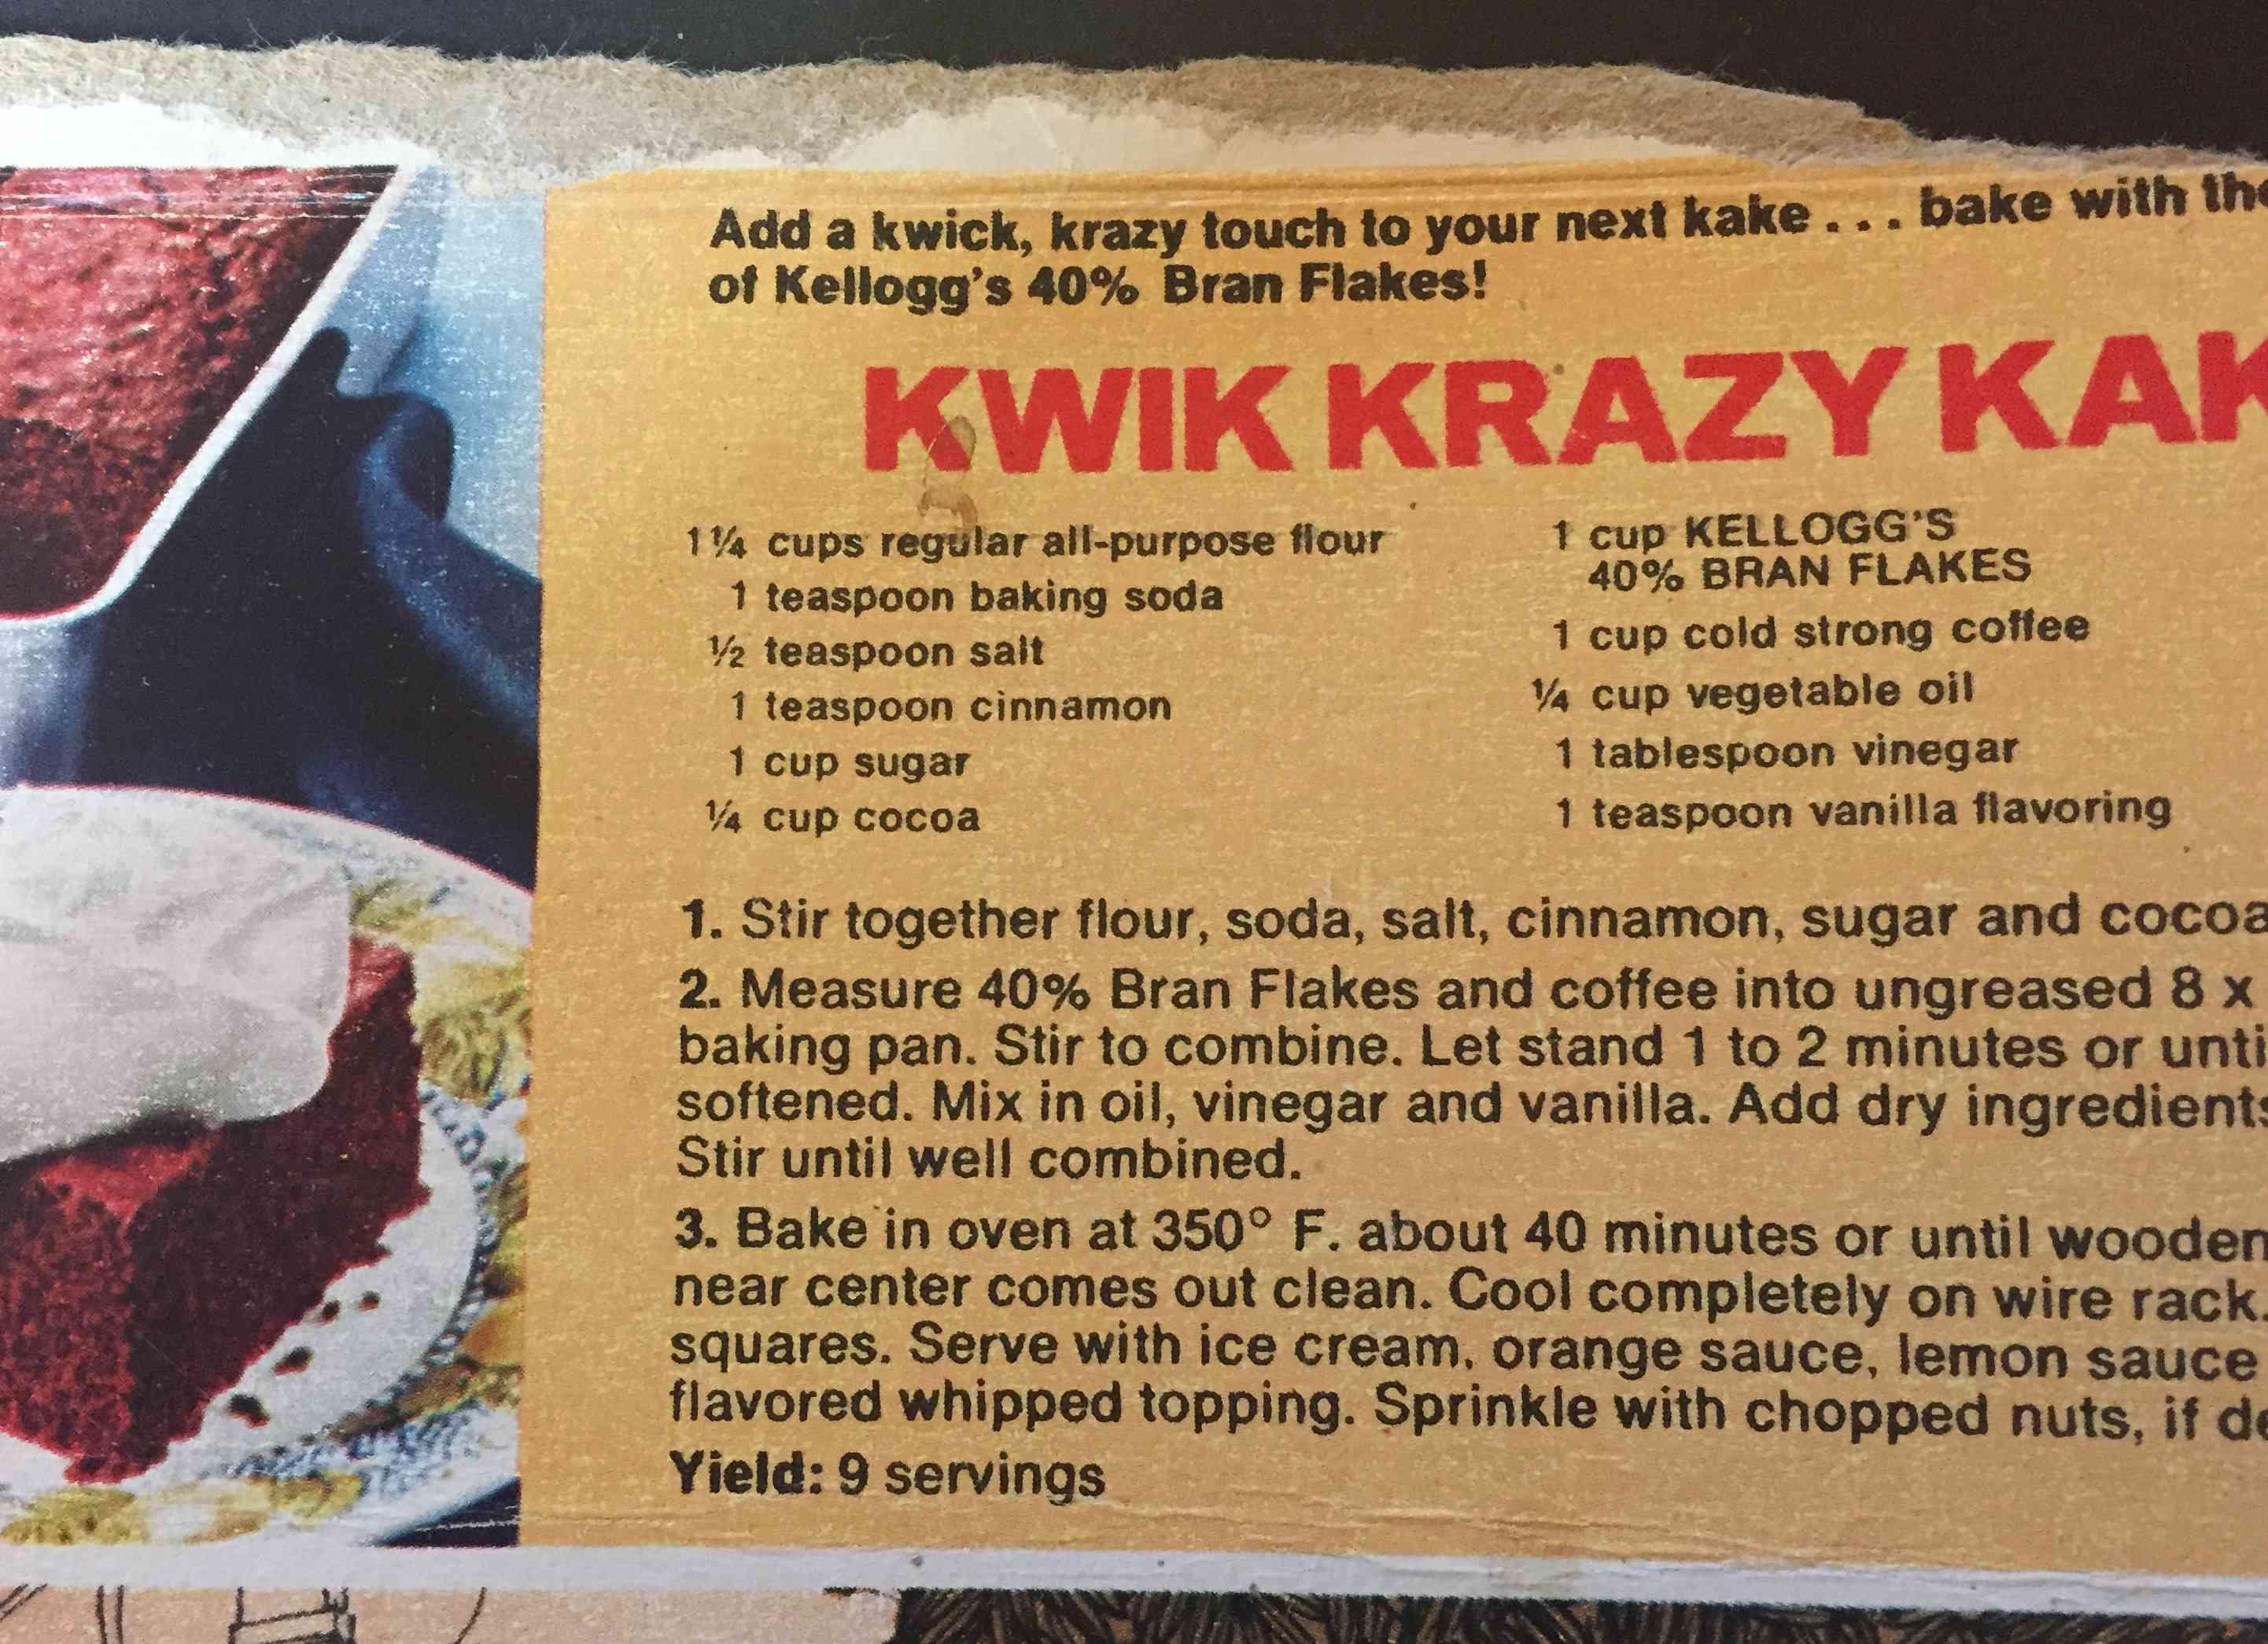 Kwik Krazy Kake